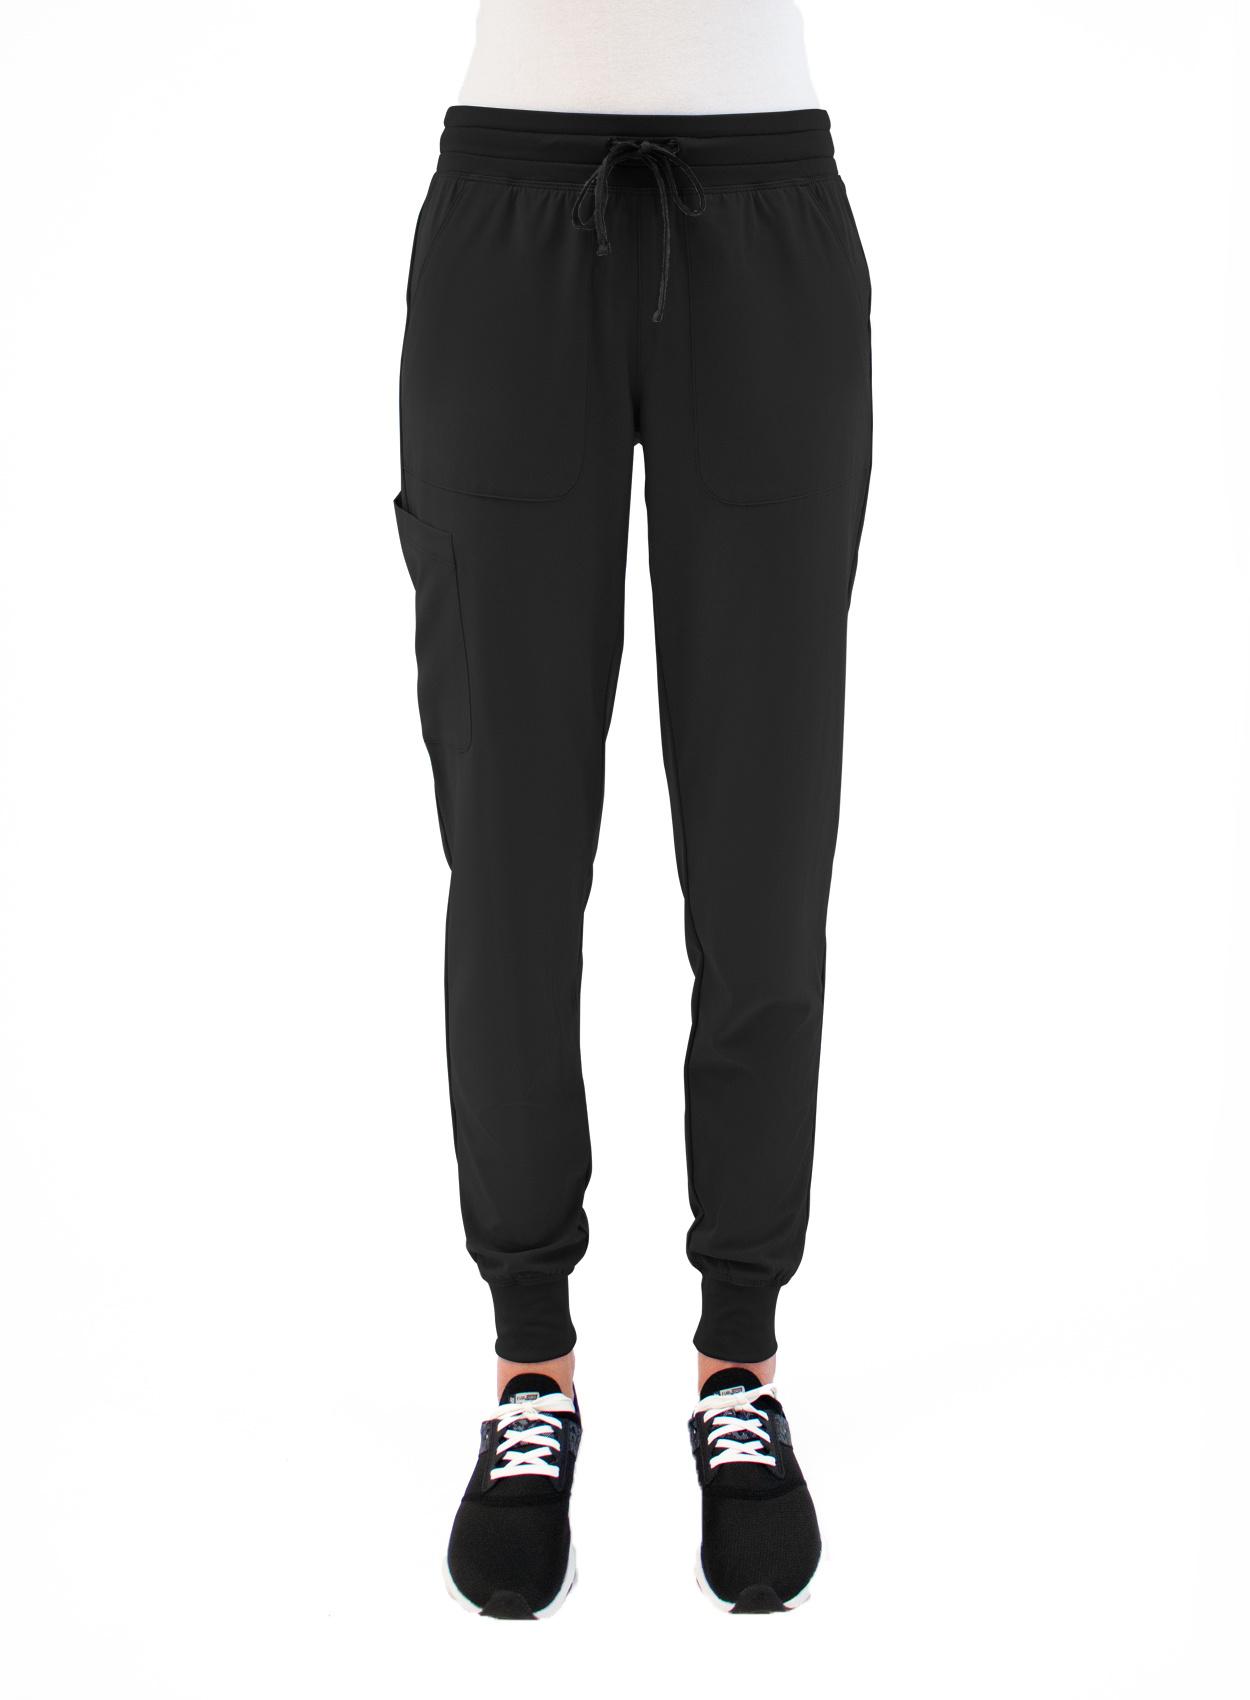 MATRIX IMPULSE Black Yoga Waistband Tall Women's Jogger Pants 8520T